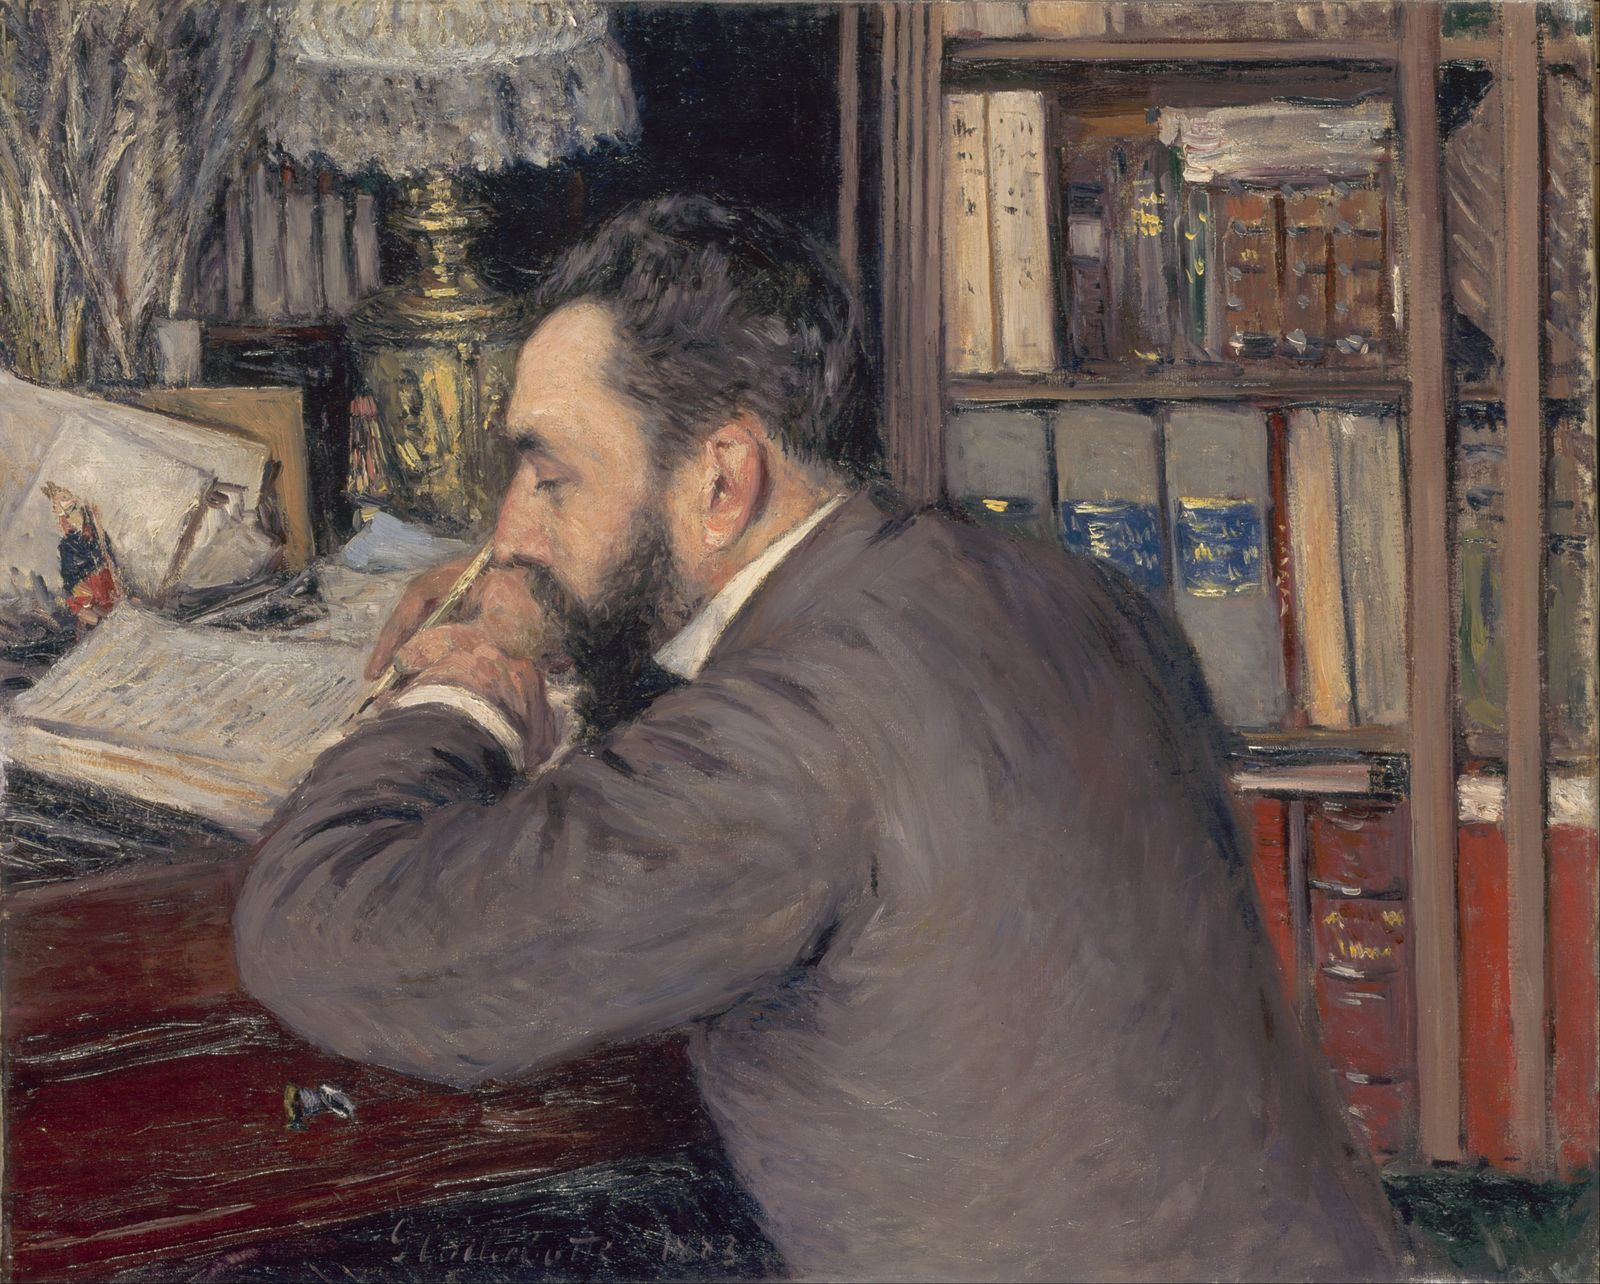 Гюстав Кайботт «Портрет Анри Кордье» (1883 65 x 81.5 см ) Музей Орсе, Париж